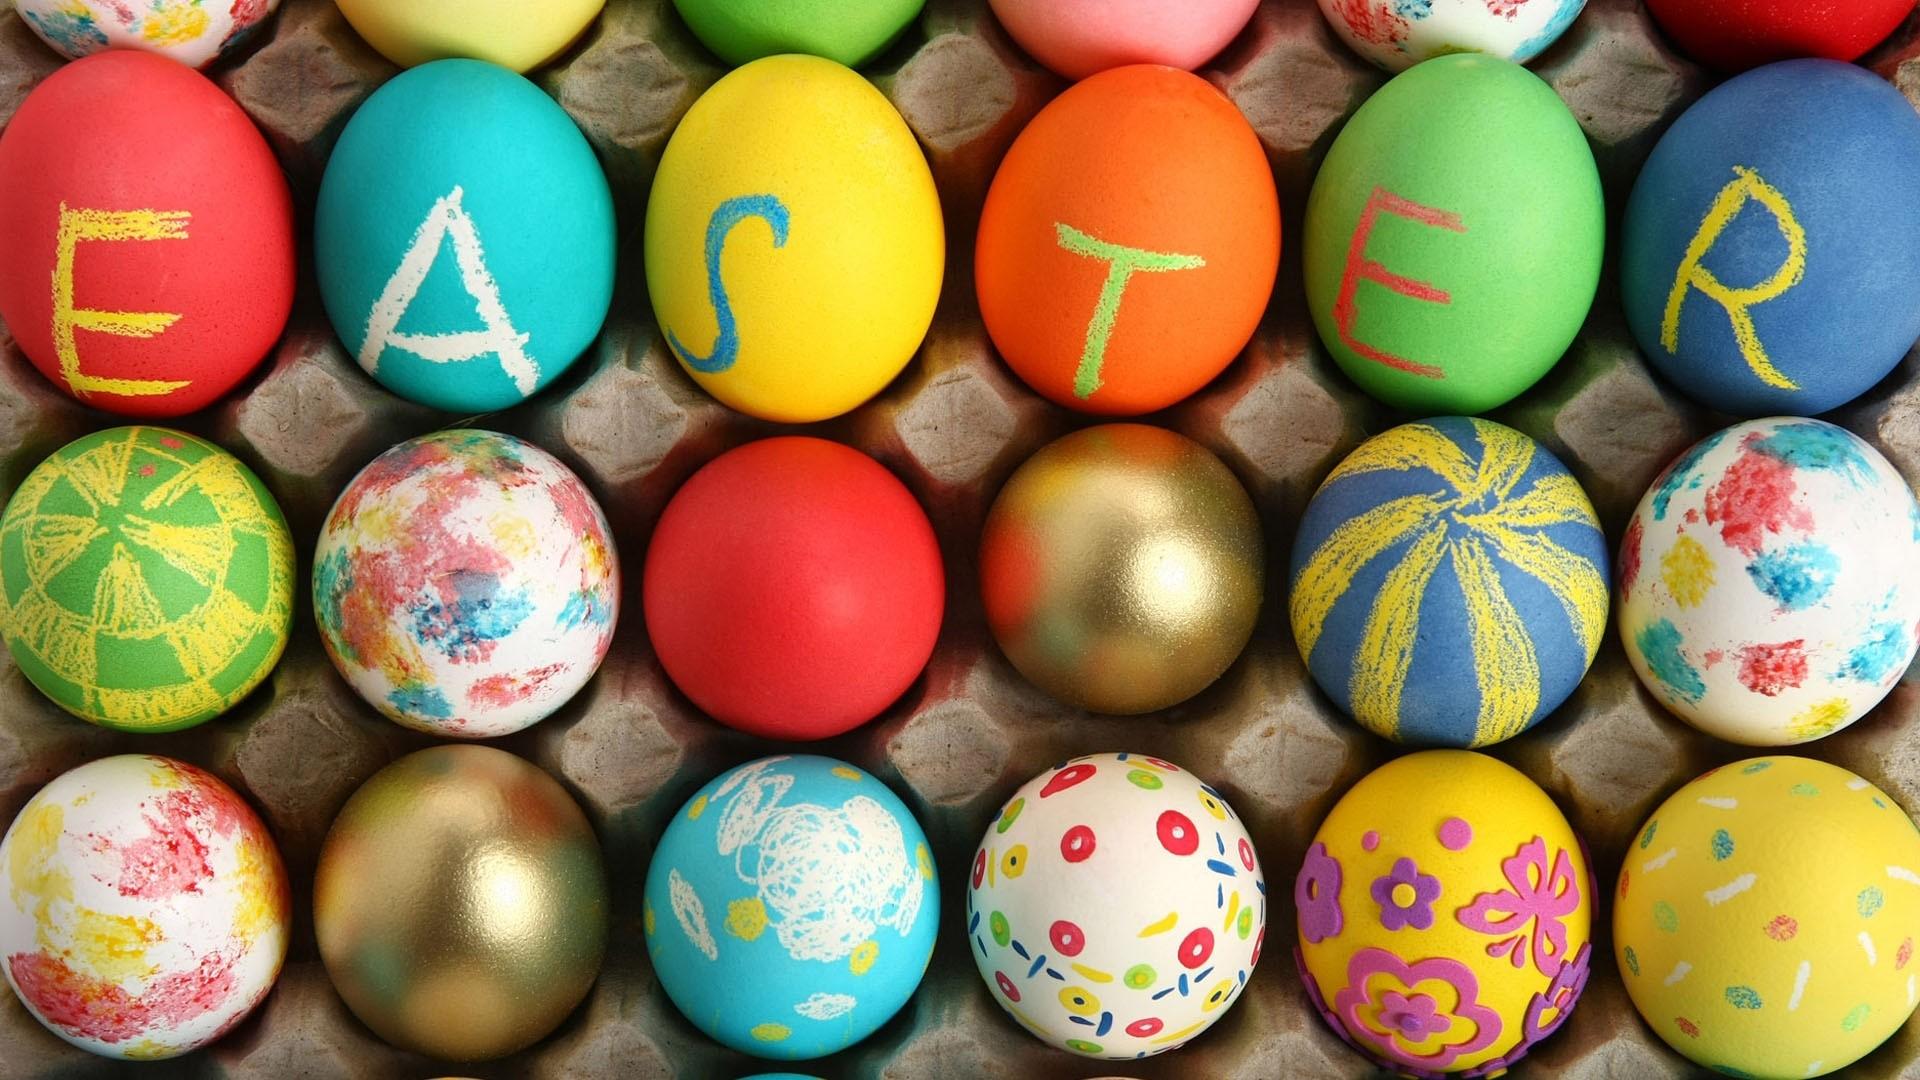 Happy Easter Eggs HD Wallpaper HD Wallpaper of 1920x1080